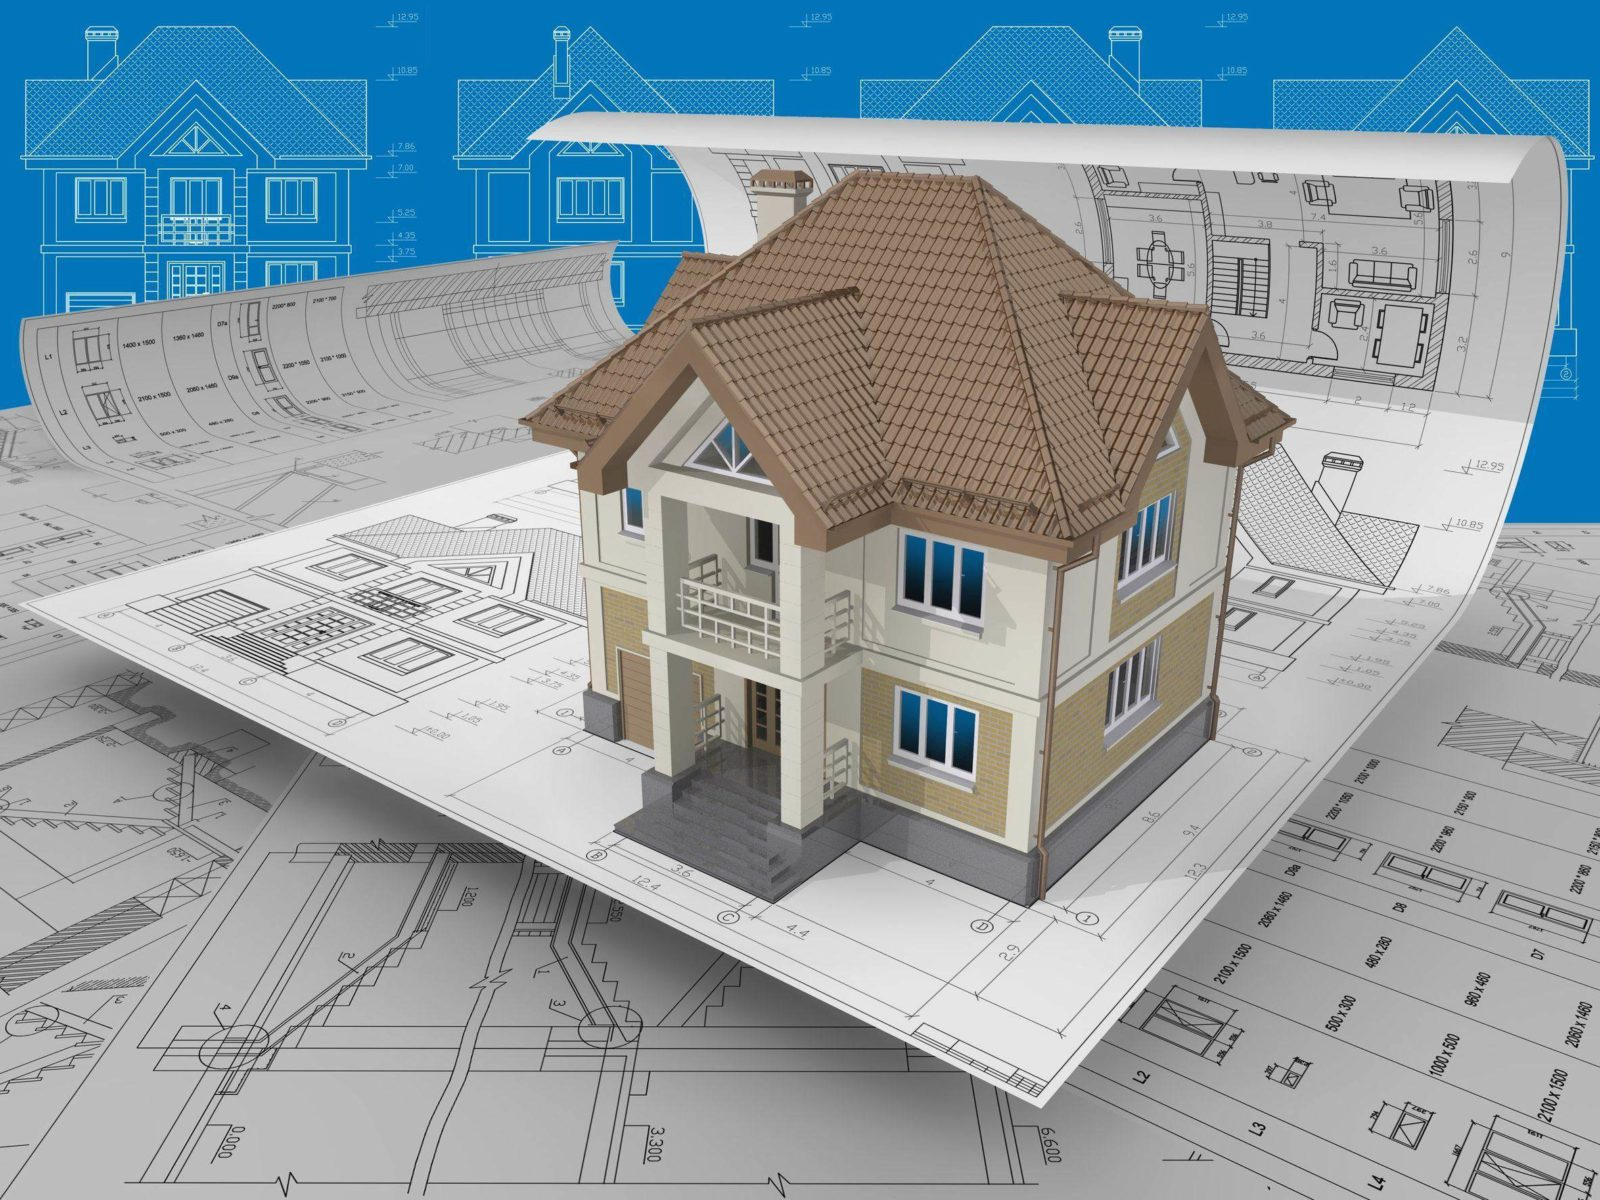 [:ua]Скільки коштує проект будинку[:ru]Сколько стоит проект дома[:]